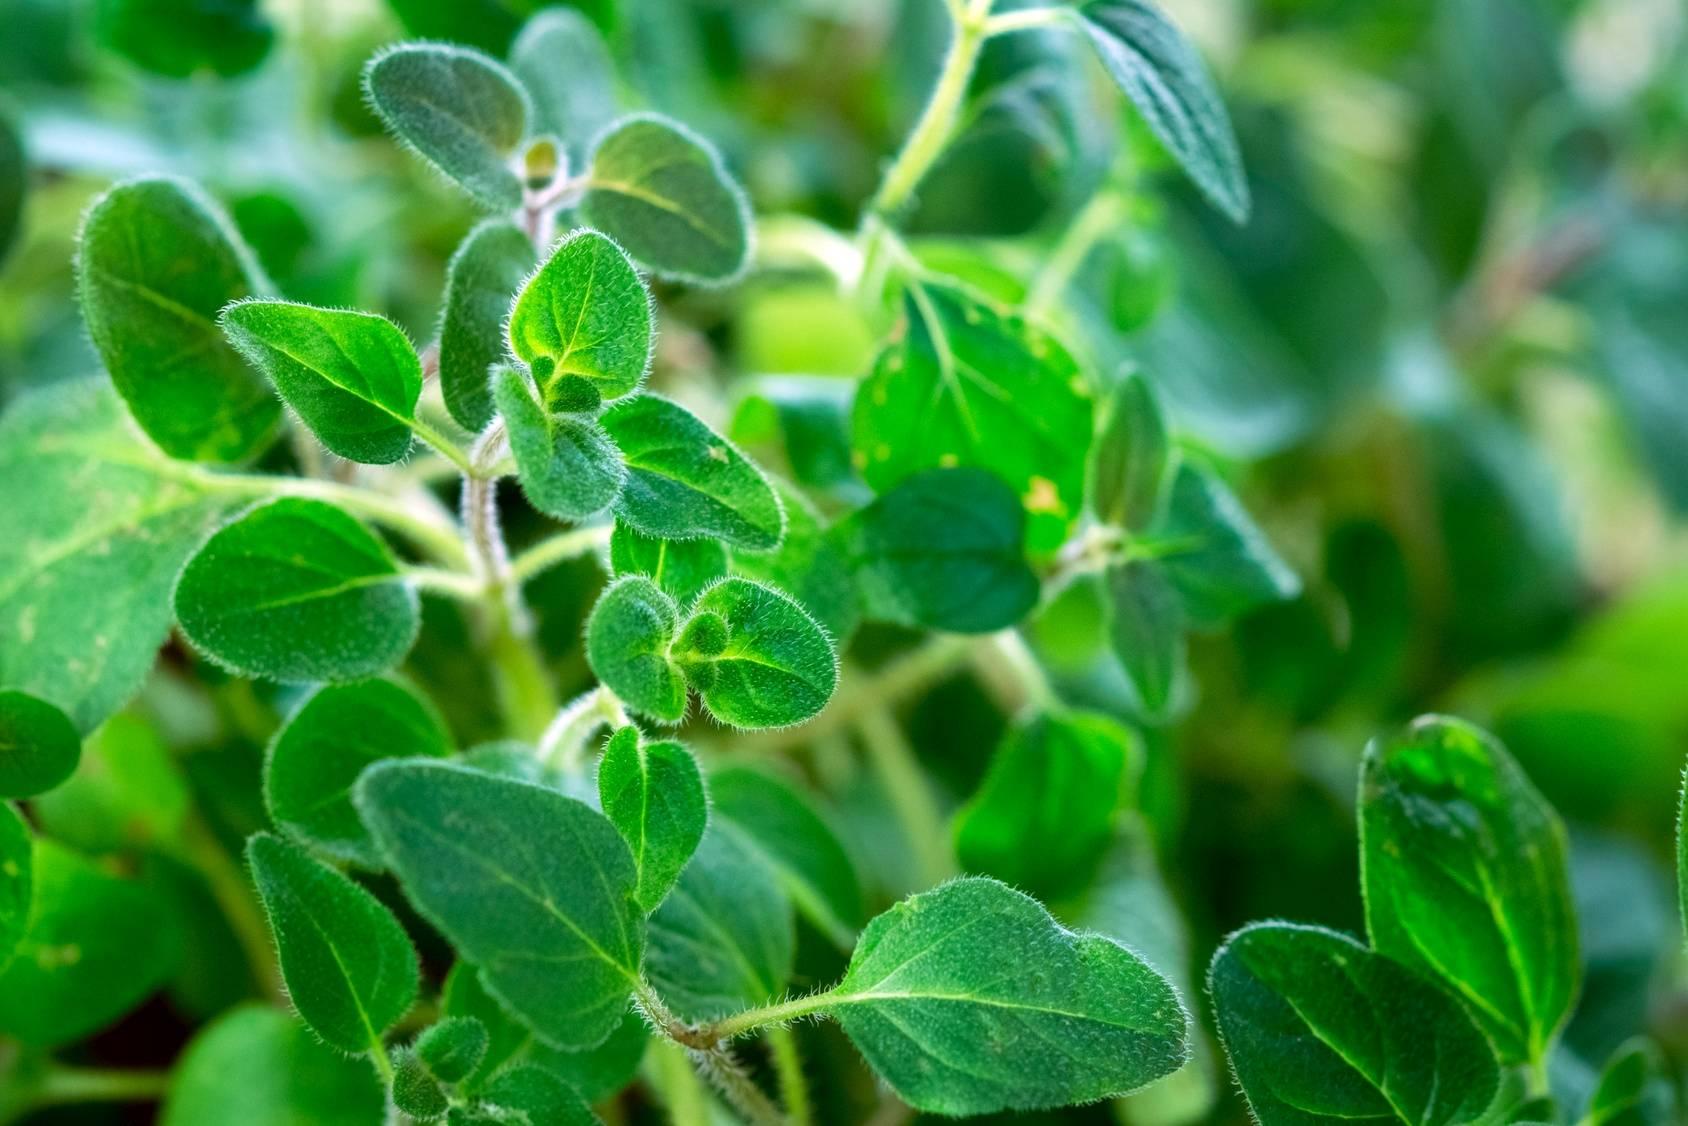 Oregano - zioła na parapecie.